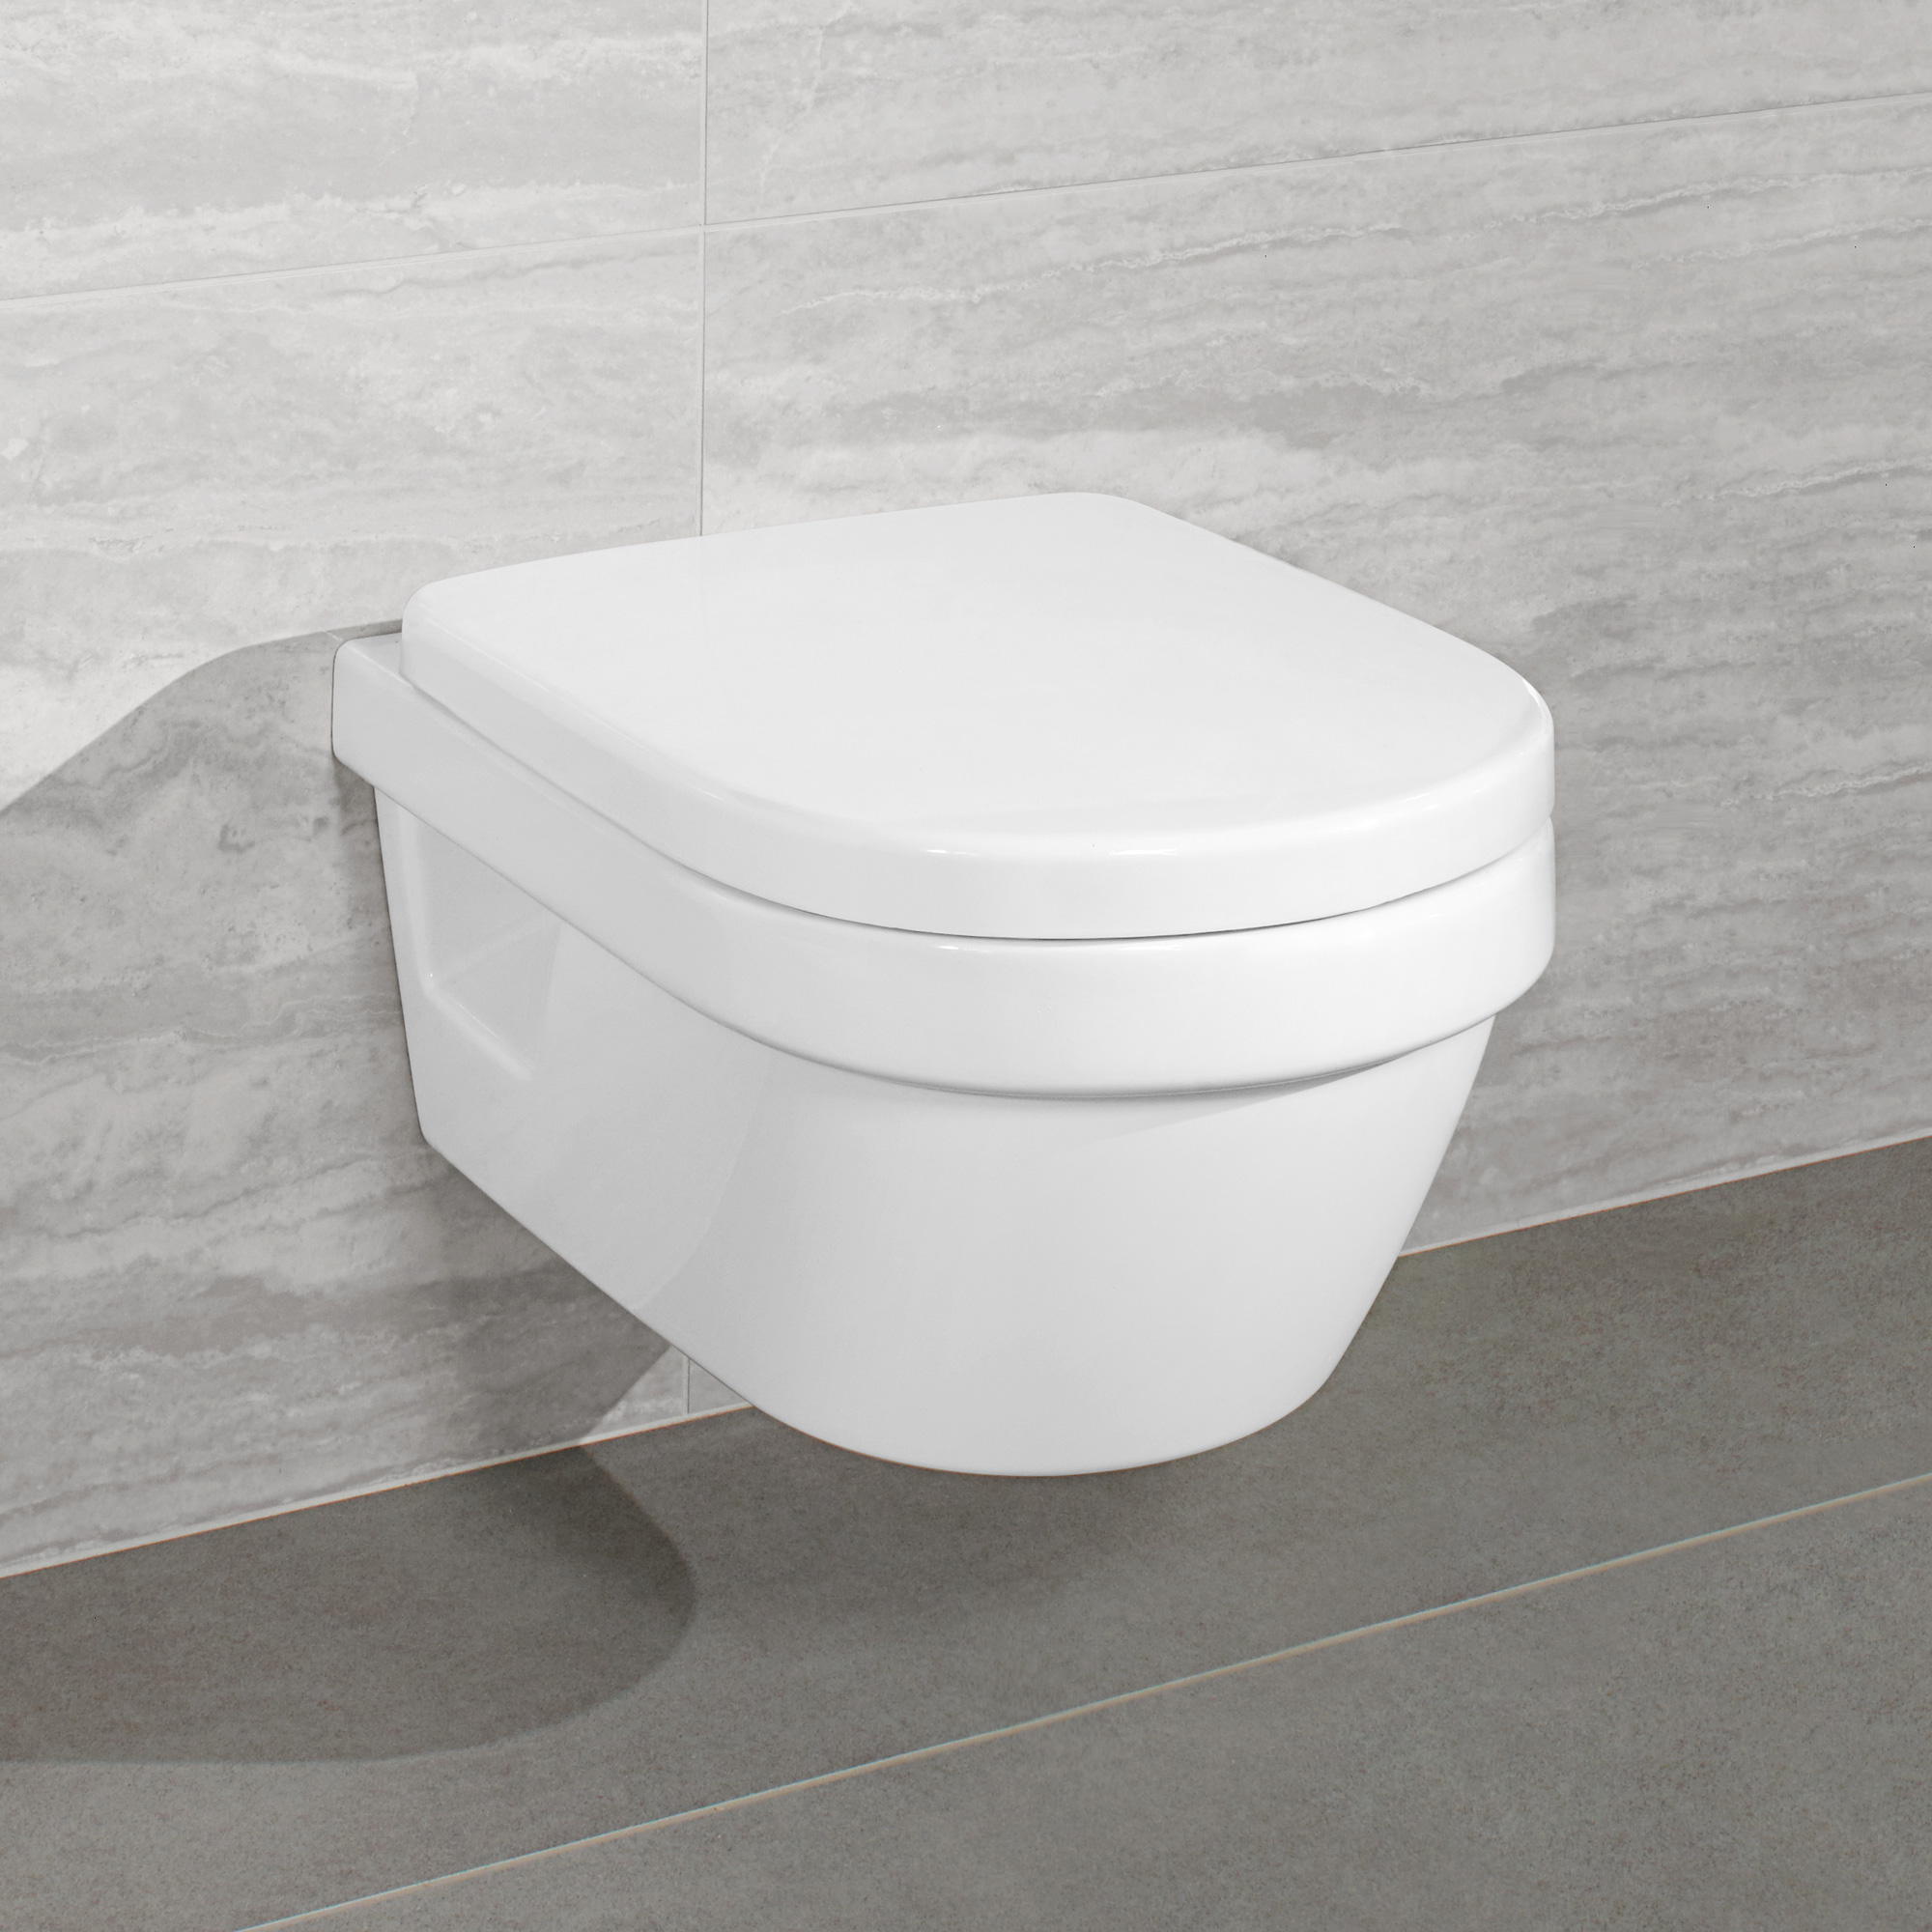 villeroy boch architectura wc sitz compact wei. Black Bedroom Furniture Sets. Home Design Ideas